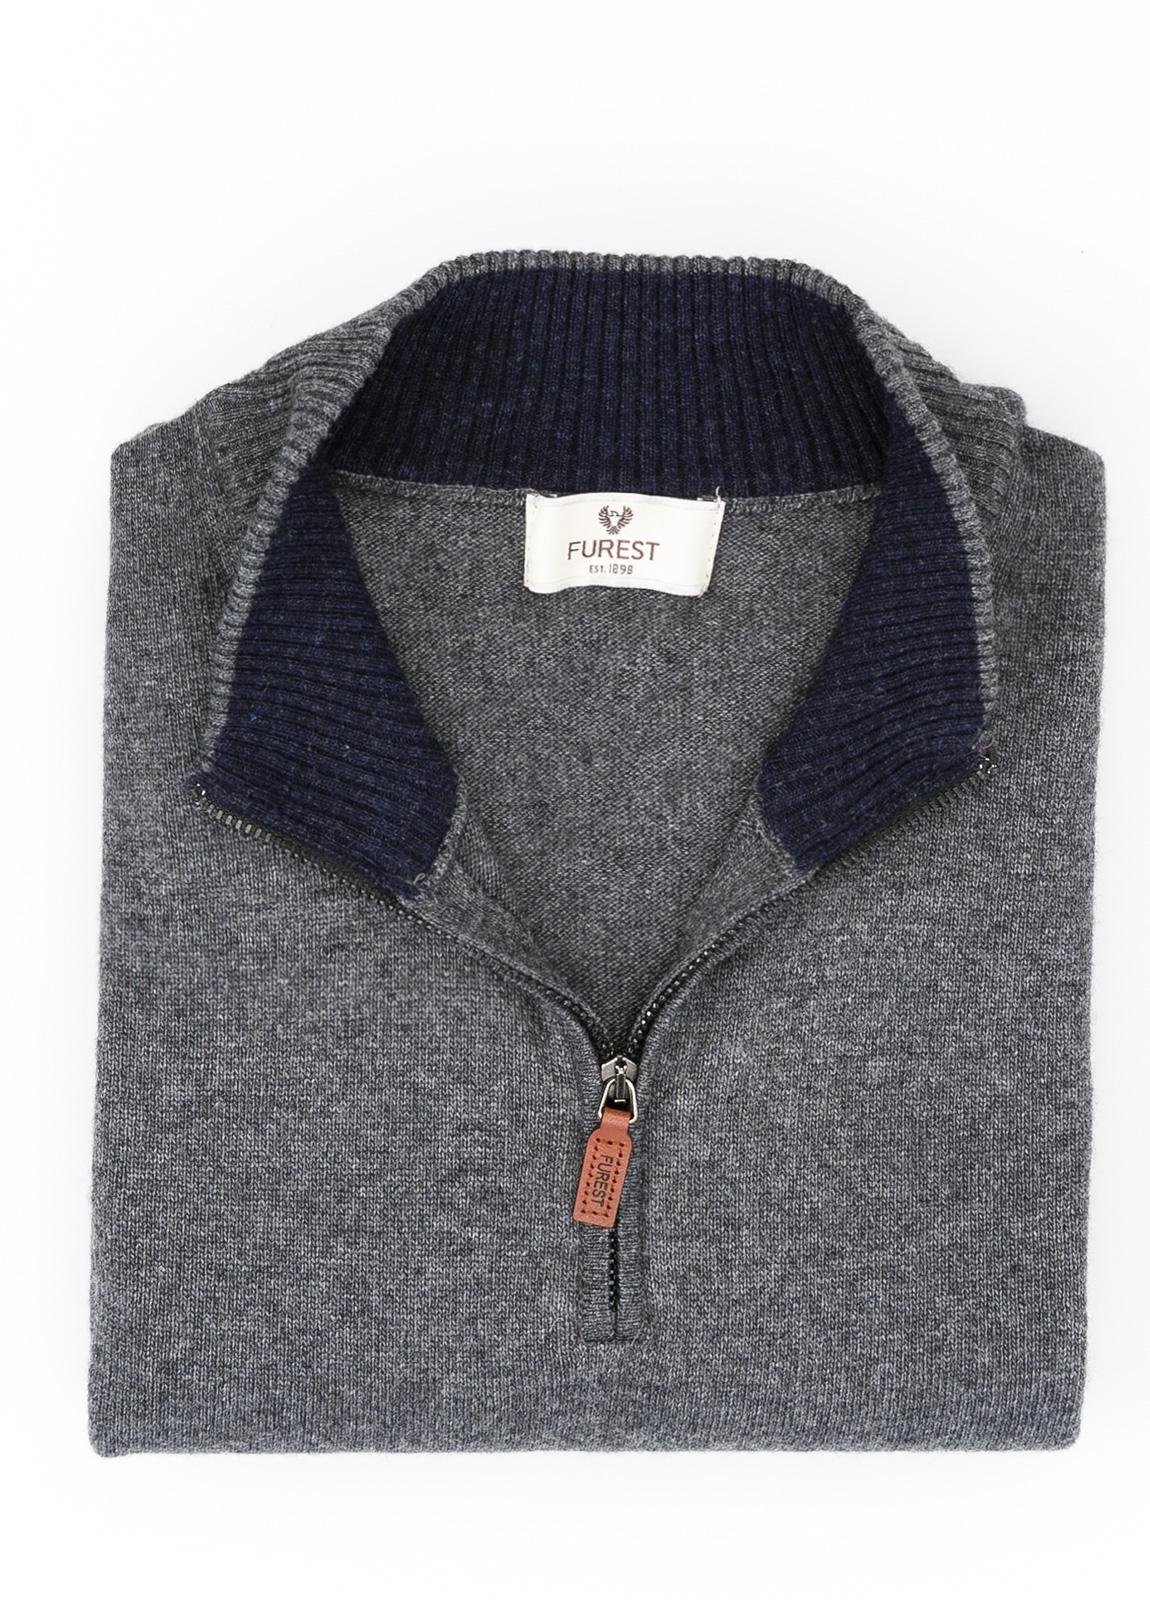 Jersey liso cuello cremallera, color gris marengo, 40% lana merino, 30% viscosa, 10% cachemire - Ítem1